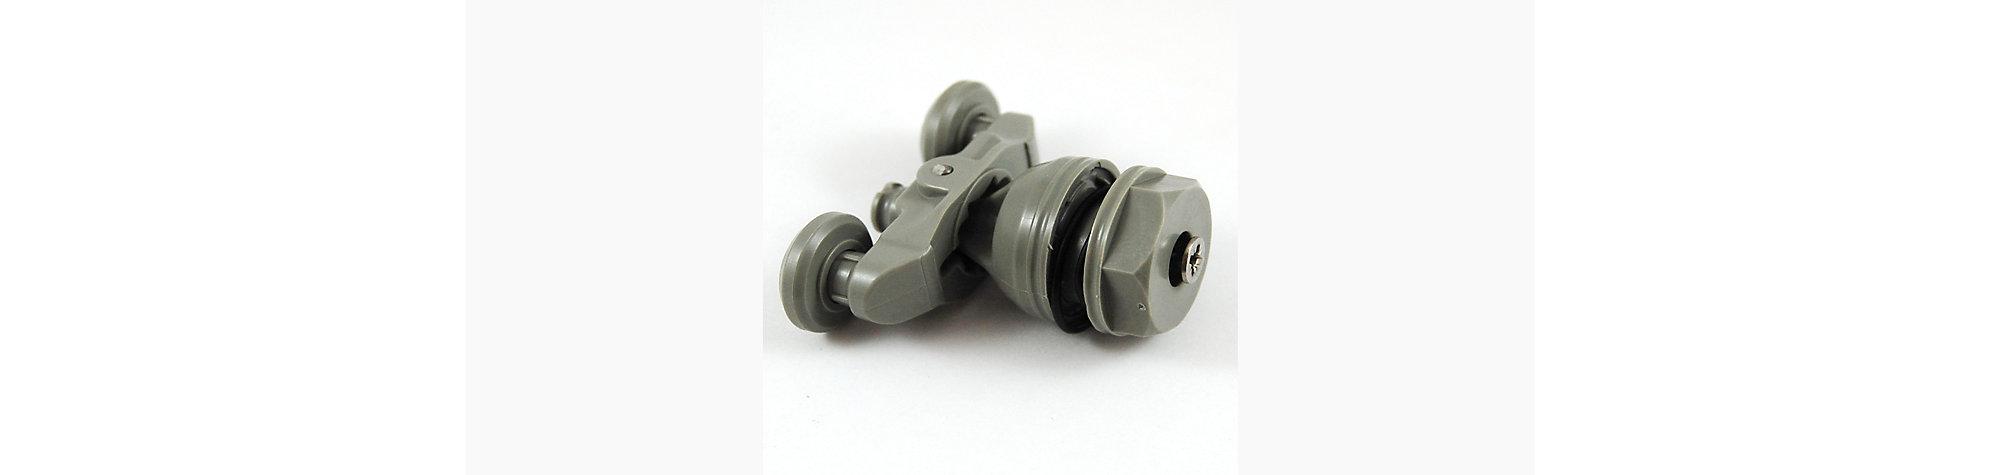 Spare Parts Kohler